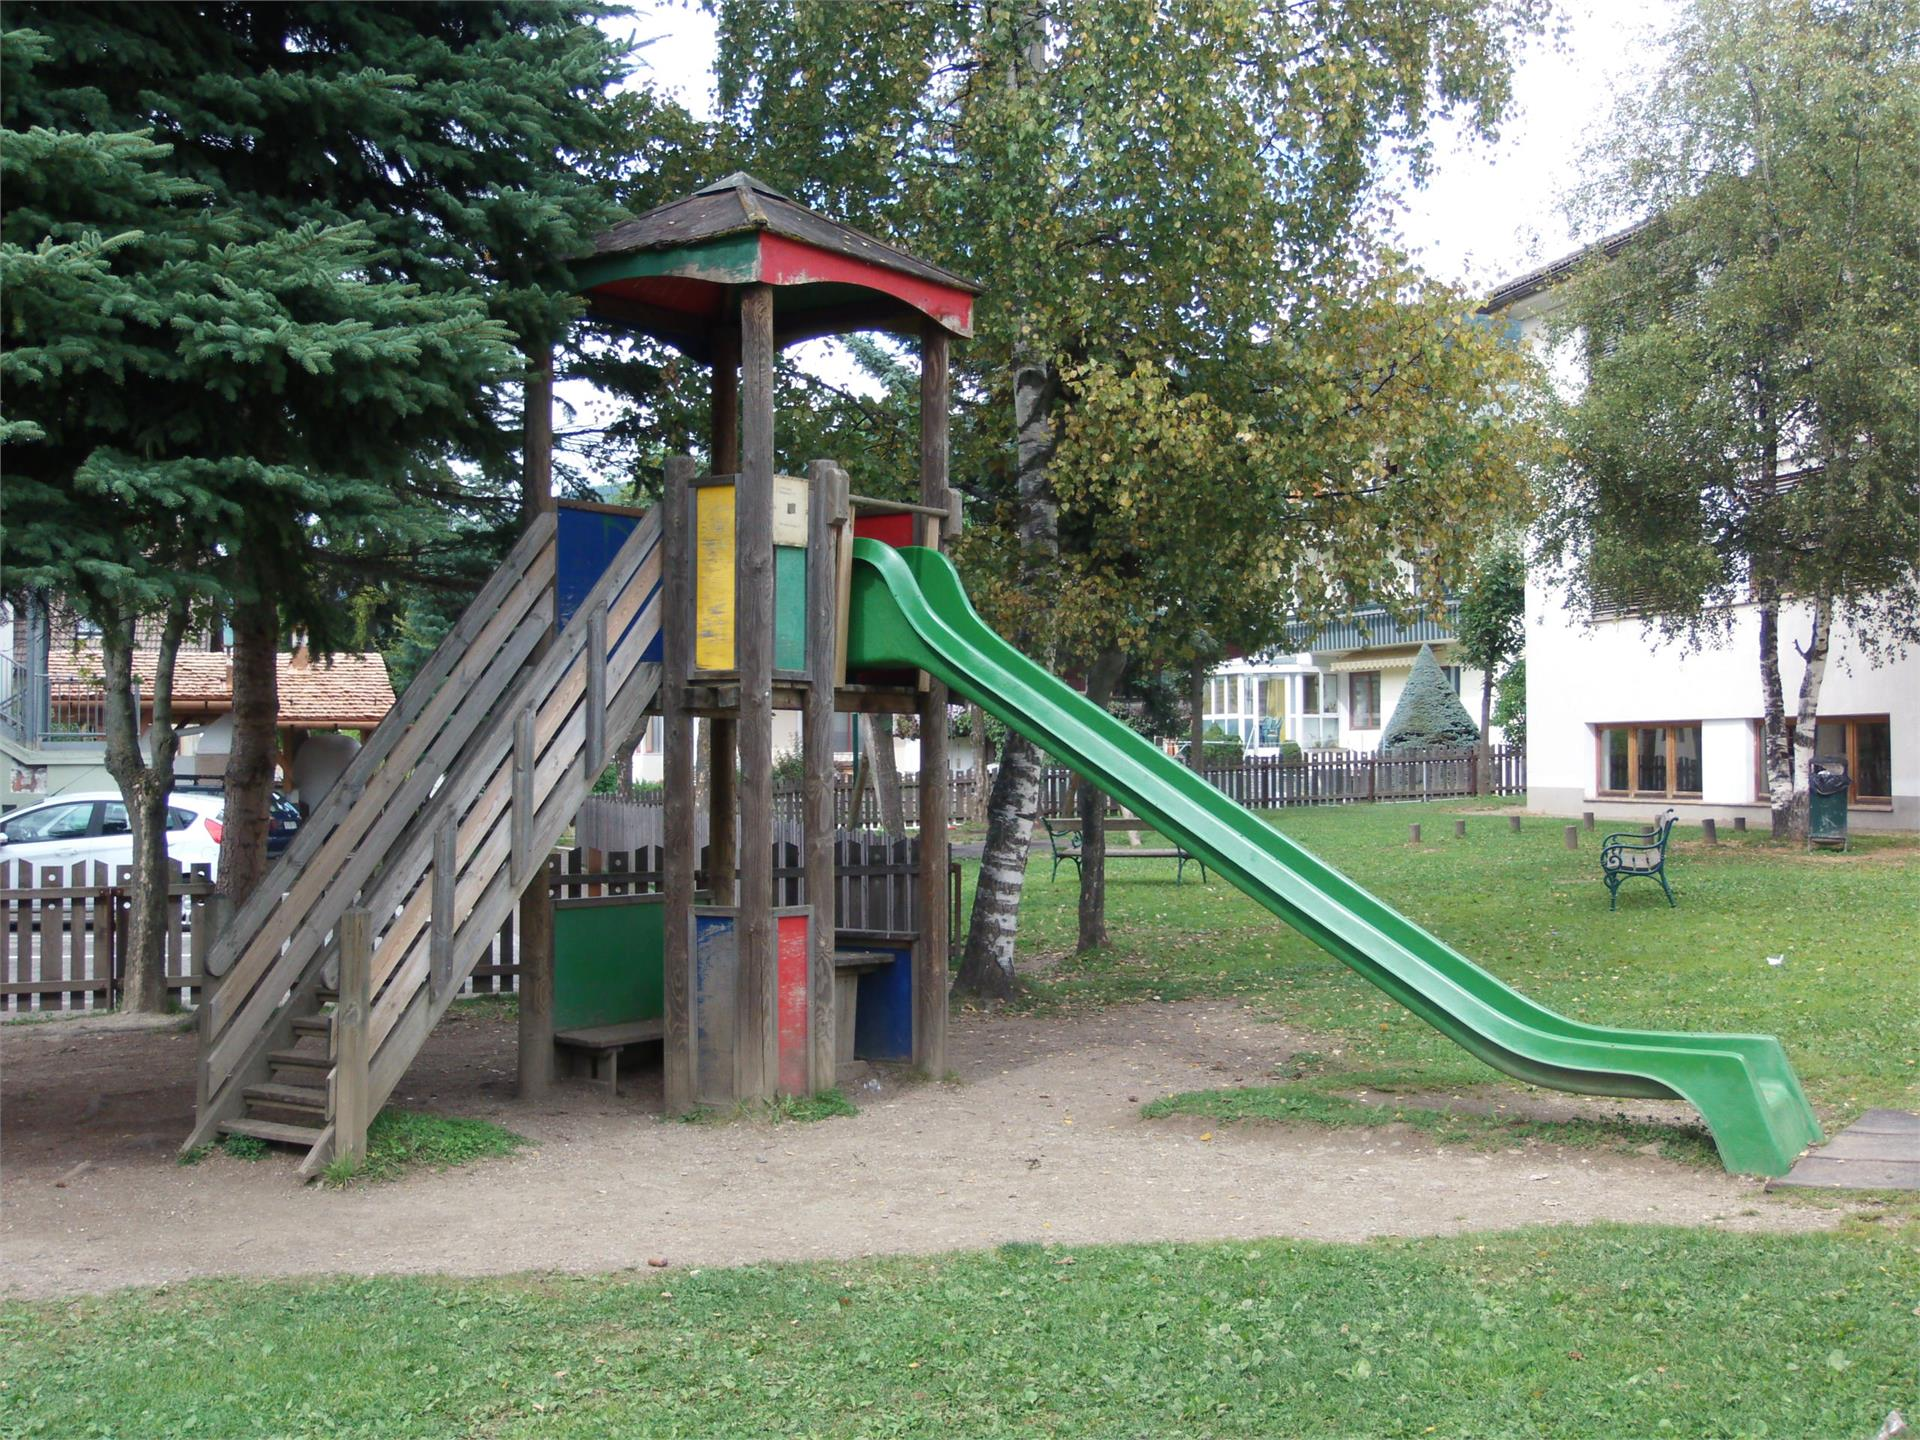 Playgroud Elementary School